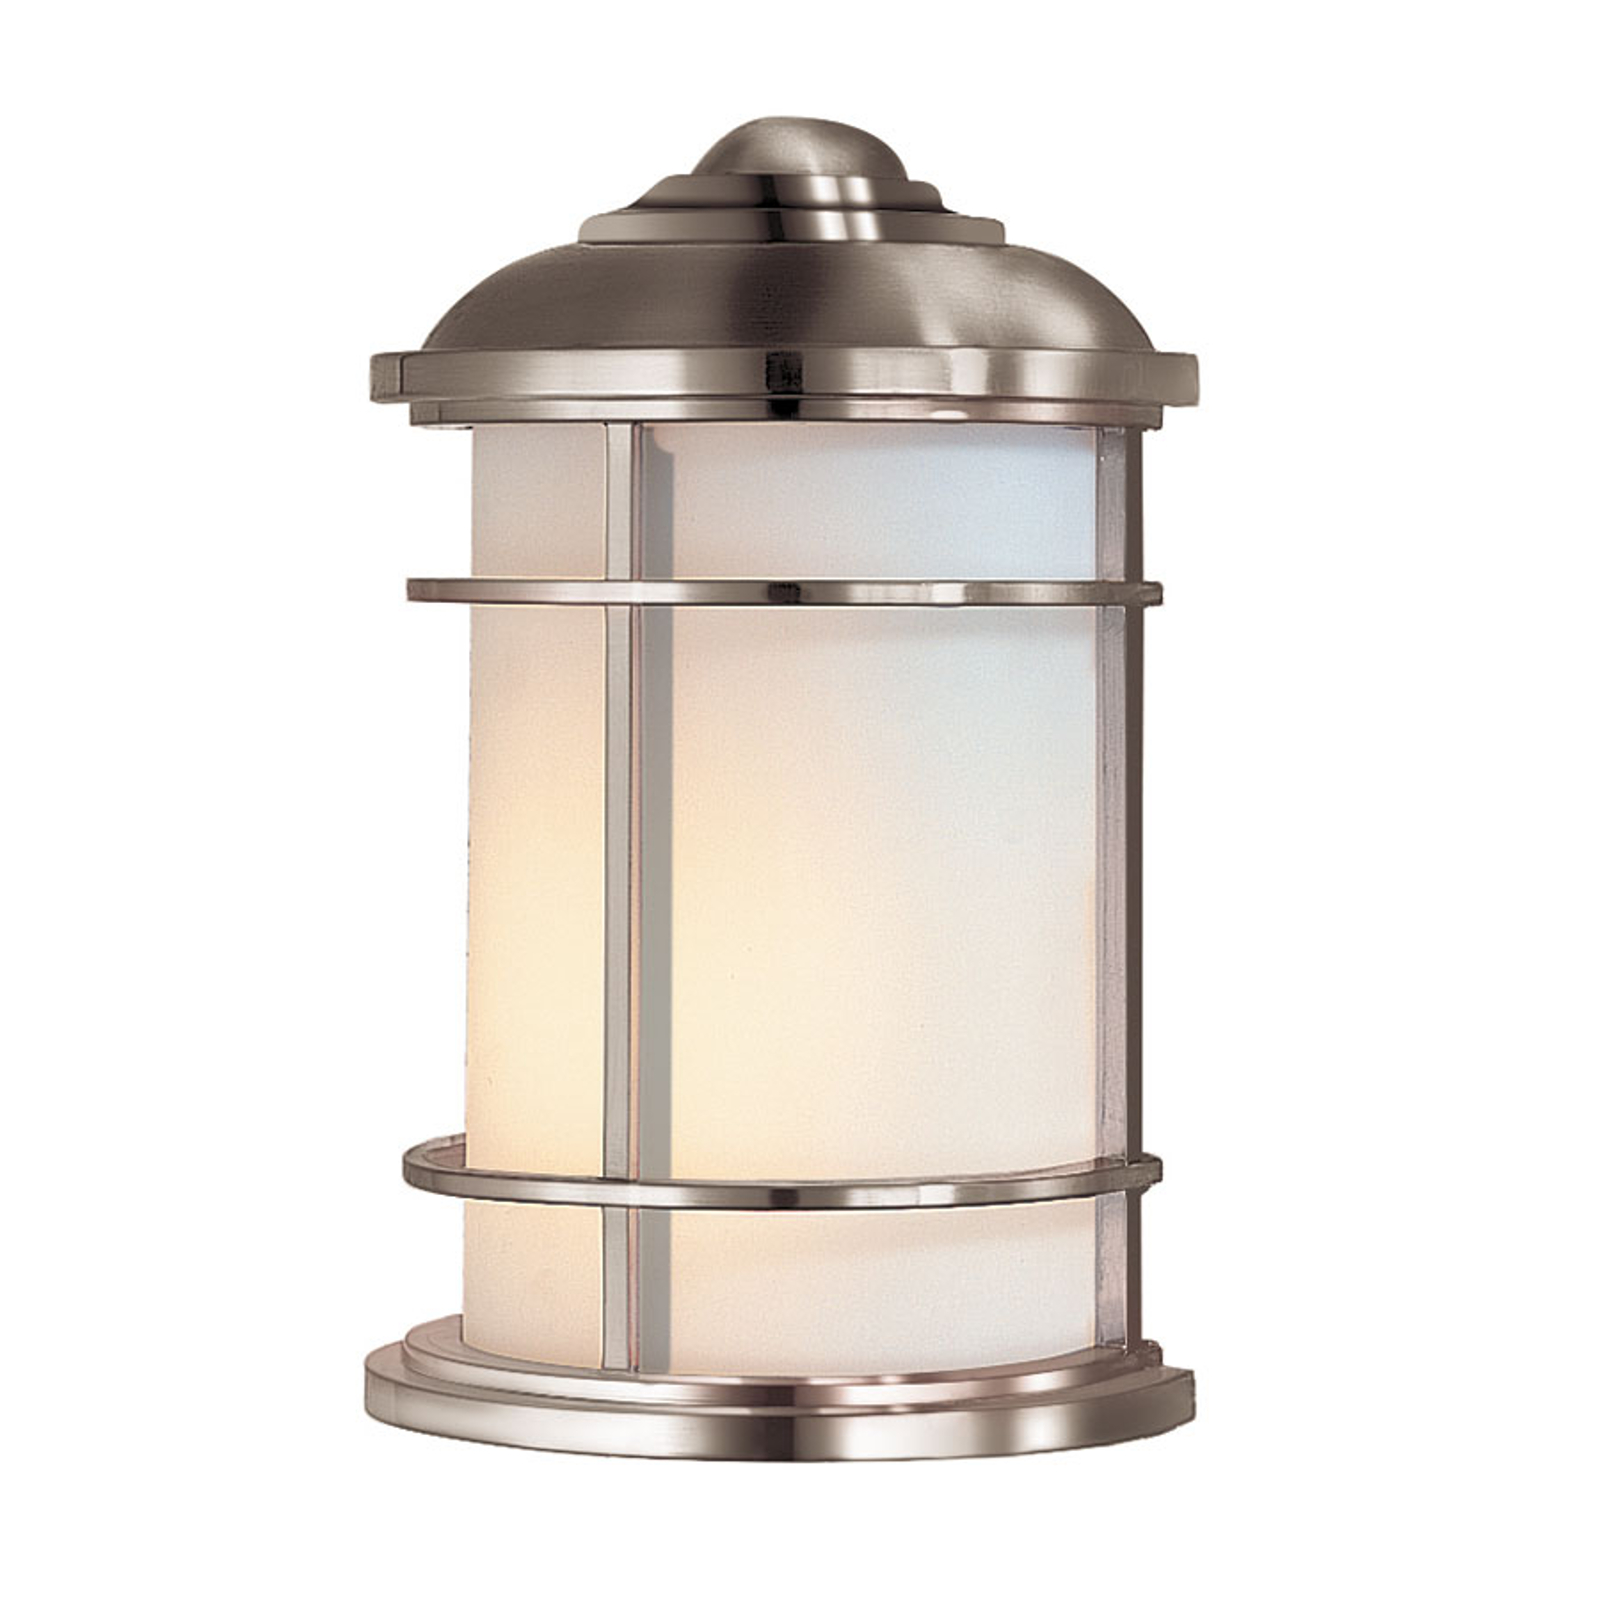 Buitenwandlamp Lighthouse, 28,8cm